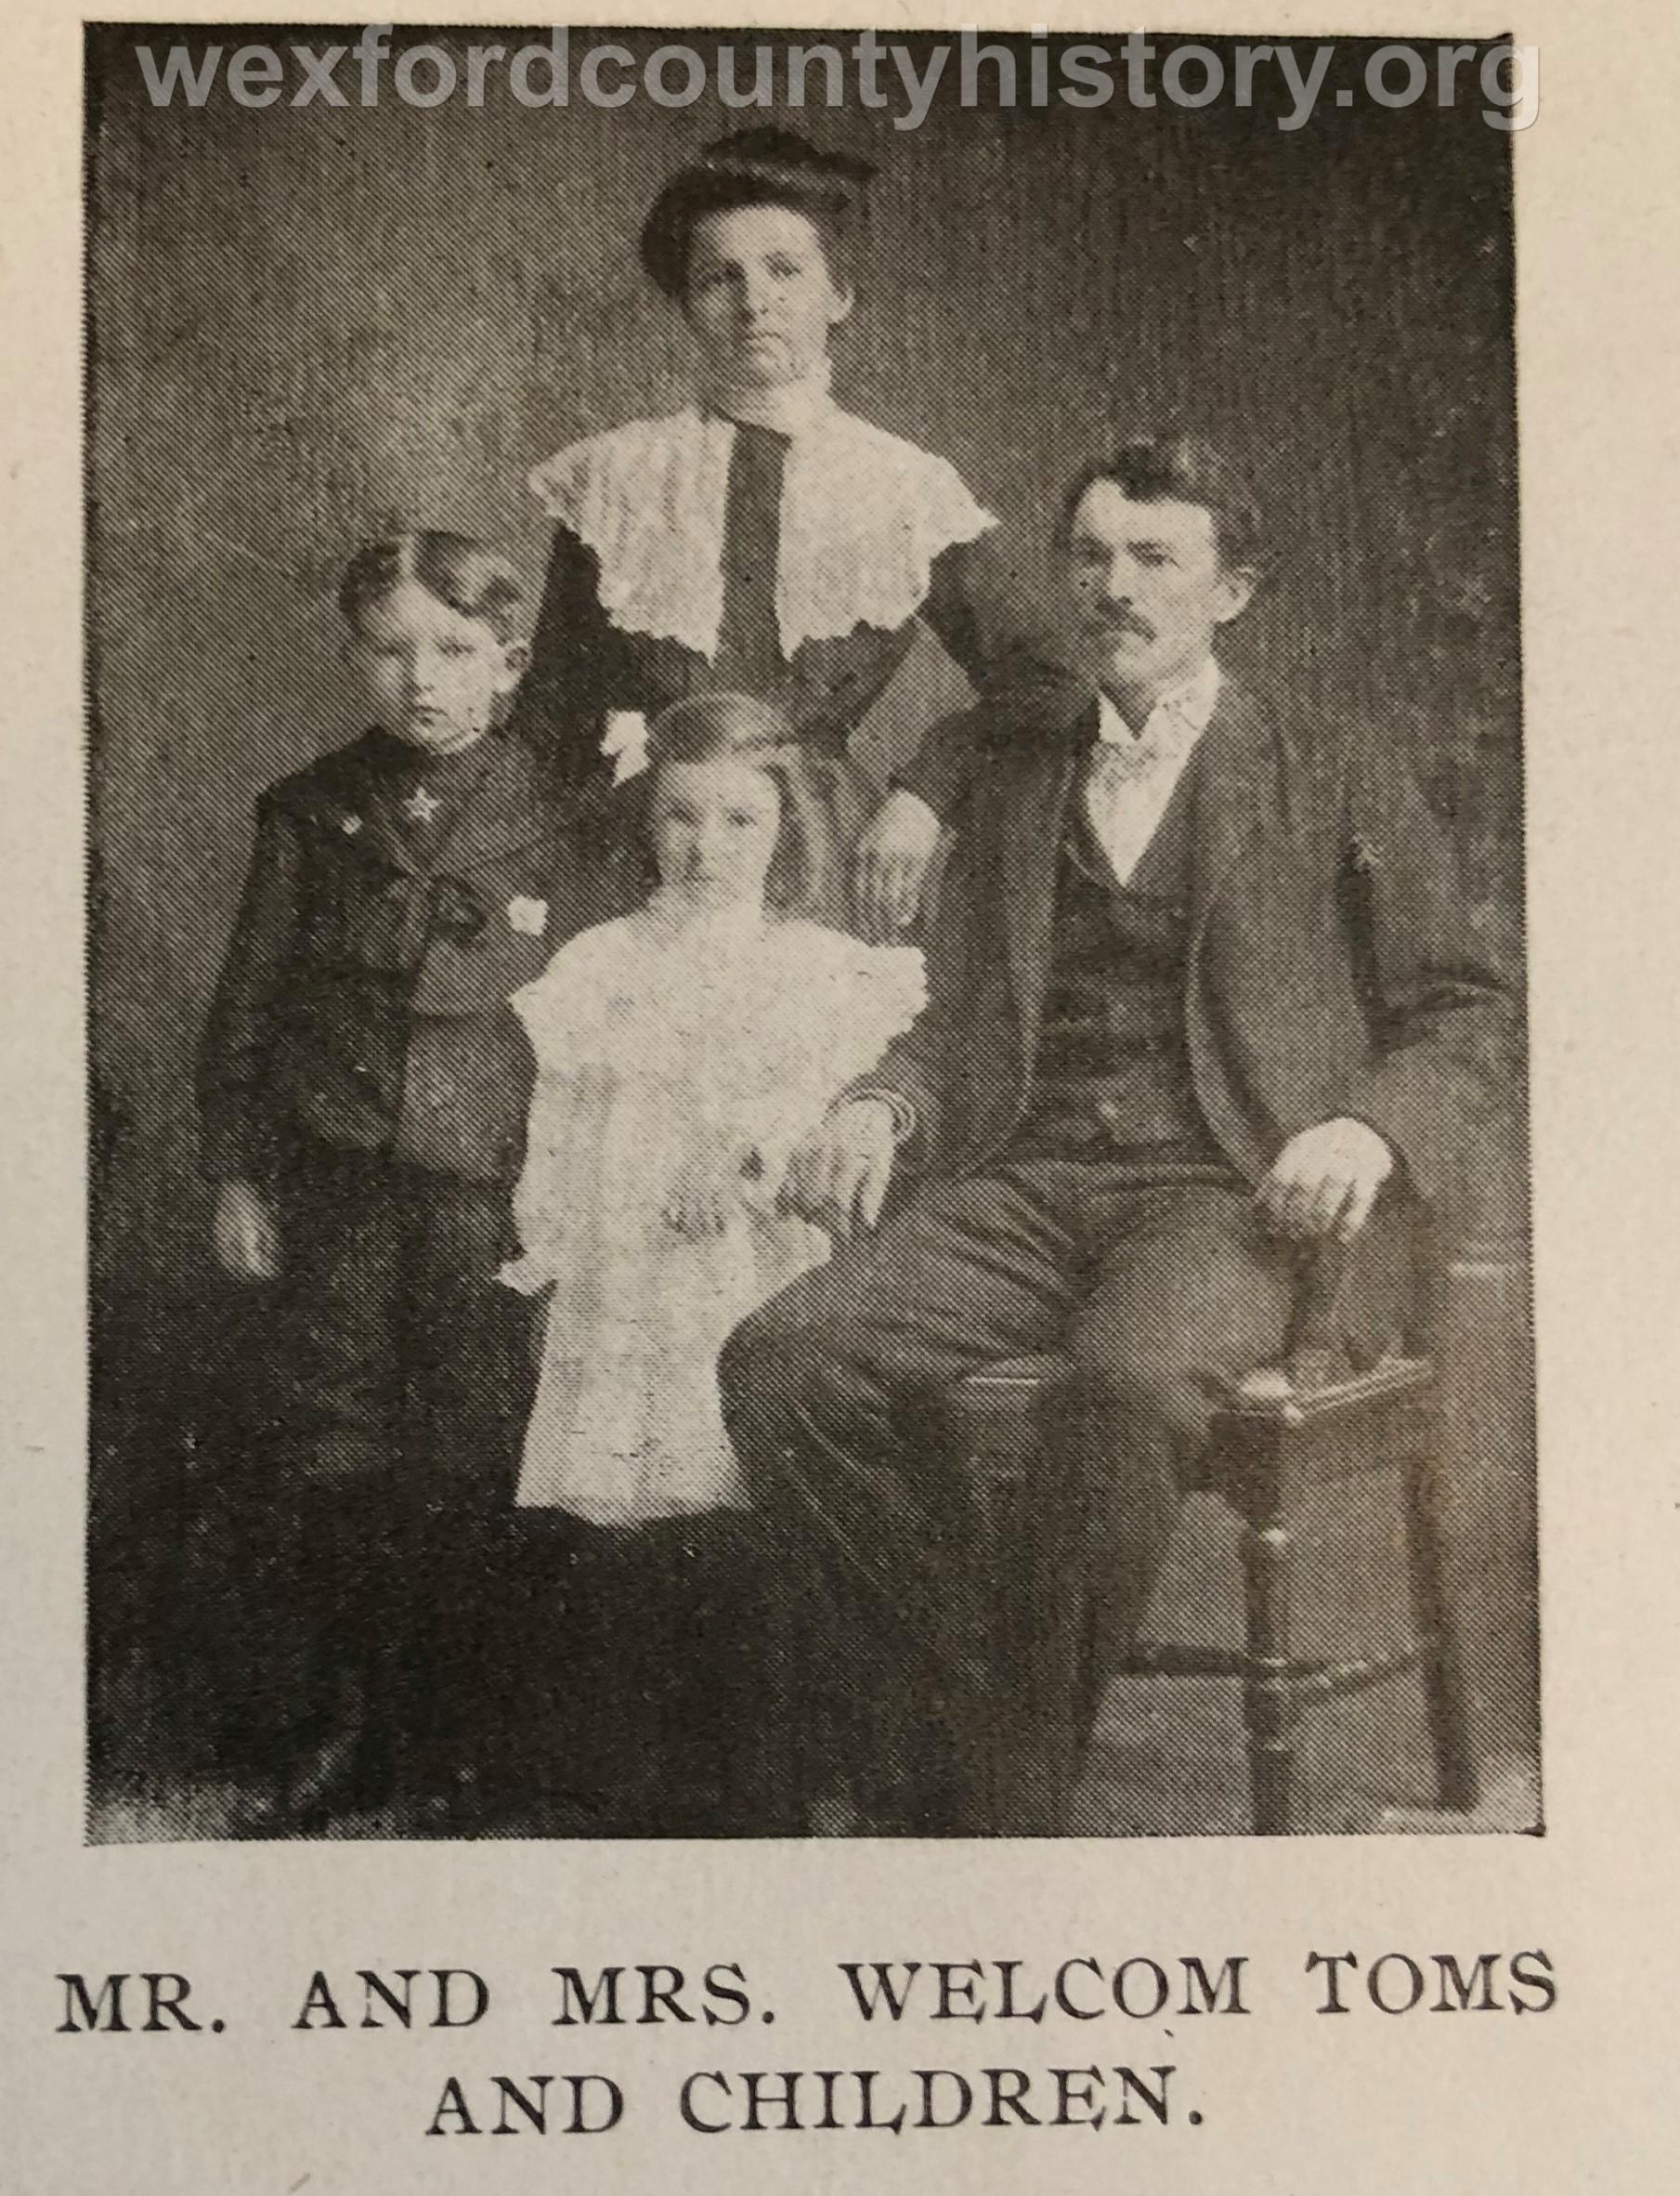 Tom Welcom Family